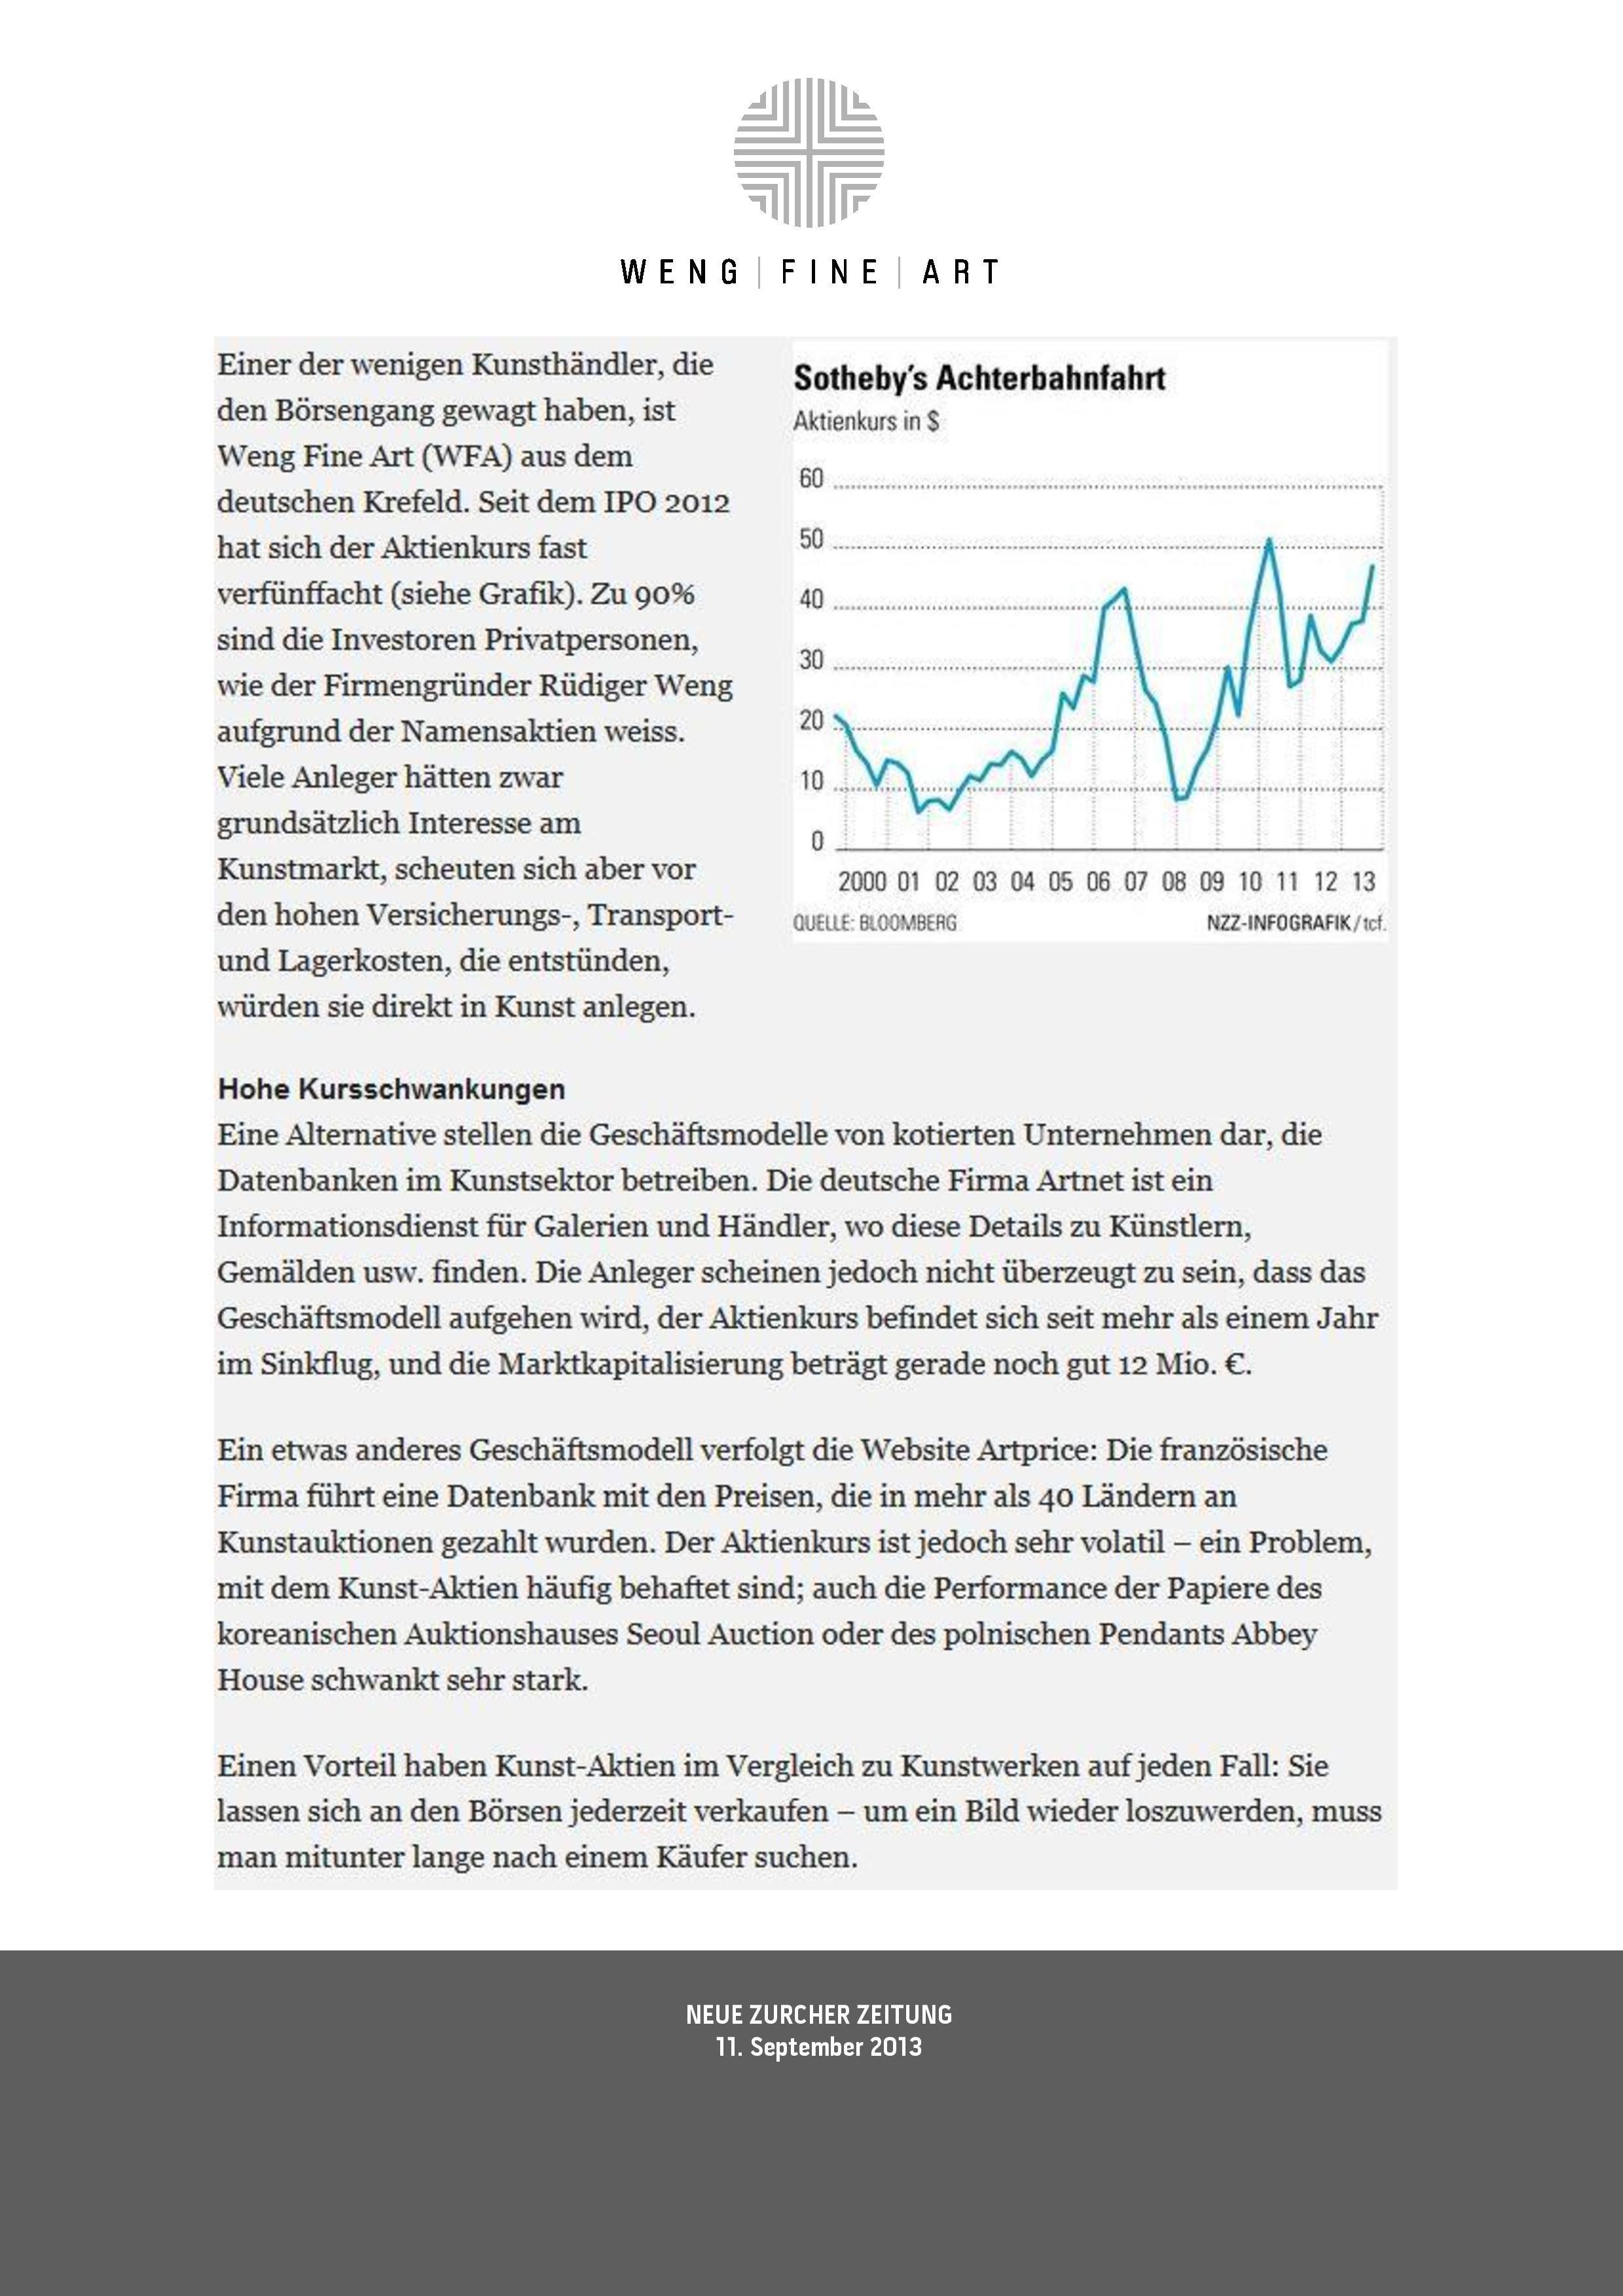 NZZ_13_09_11-page-003.jpg#asset:3486